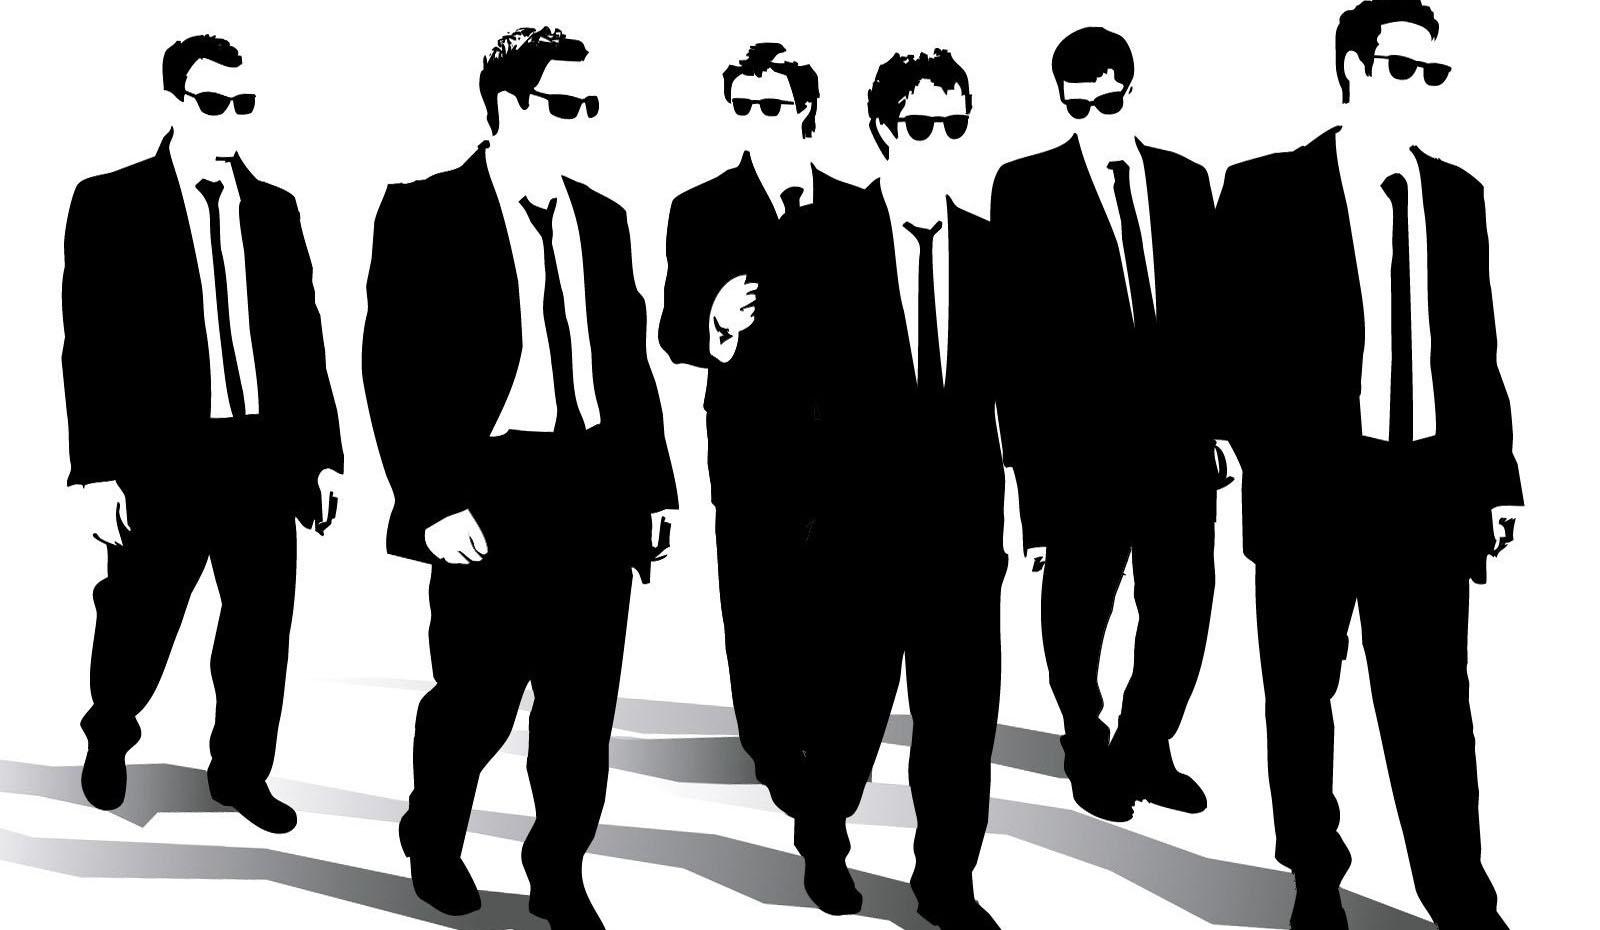 fond d u0026 39  u00e9cran   monochrome  silhouette  gentilhomme   u00e9quipe  permanent  smoking  homme  costume